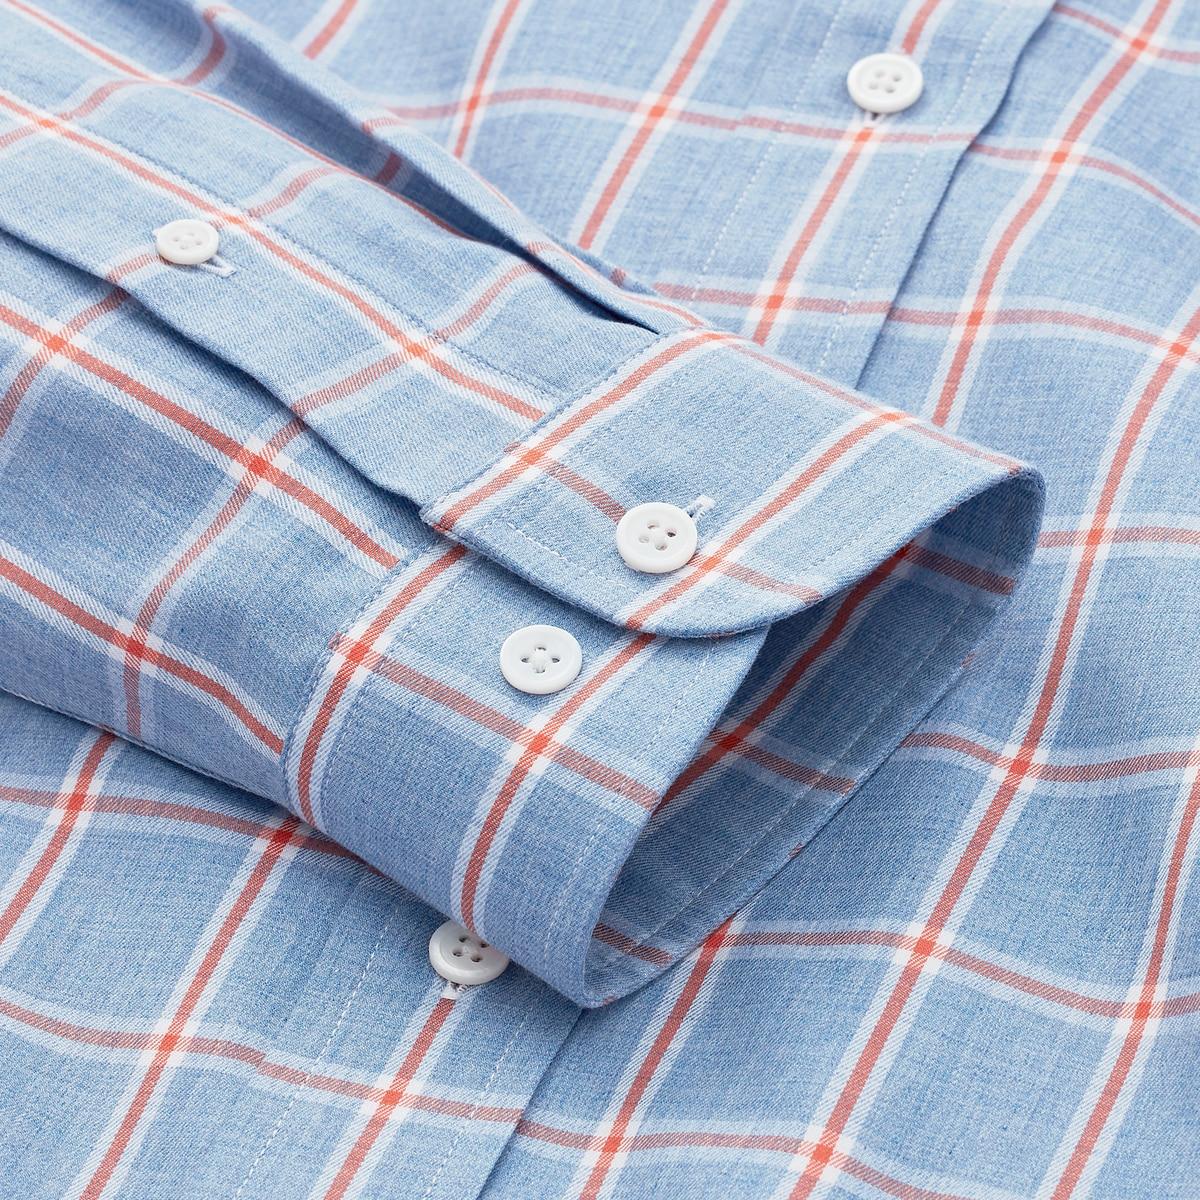 Stretch Twill Woven Plaid Shirt-Previous Season Style